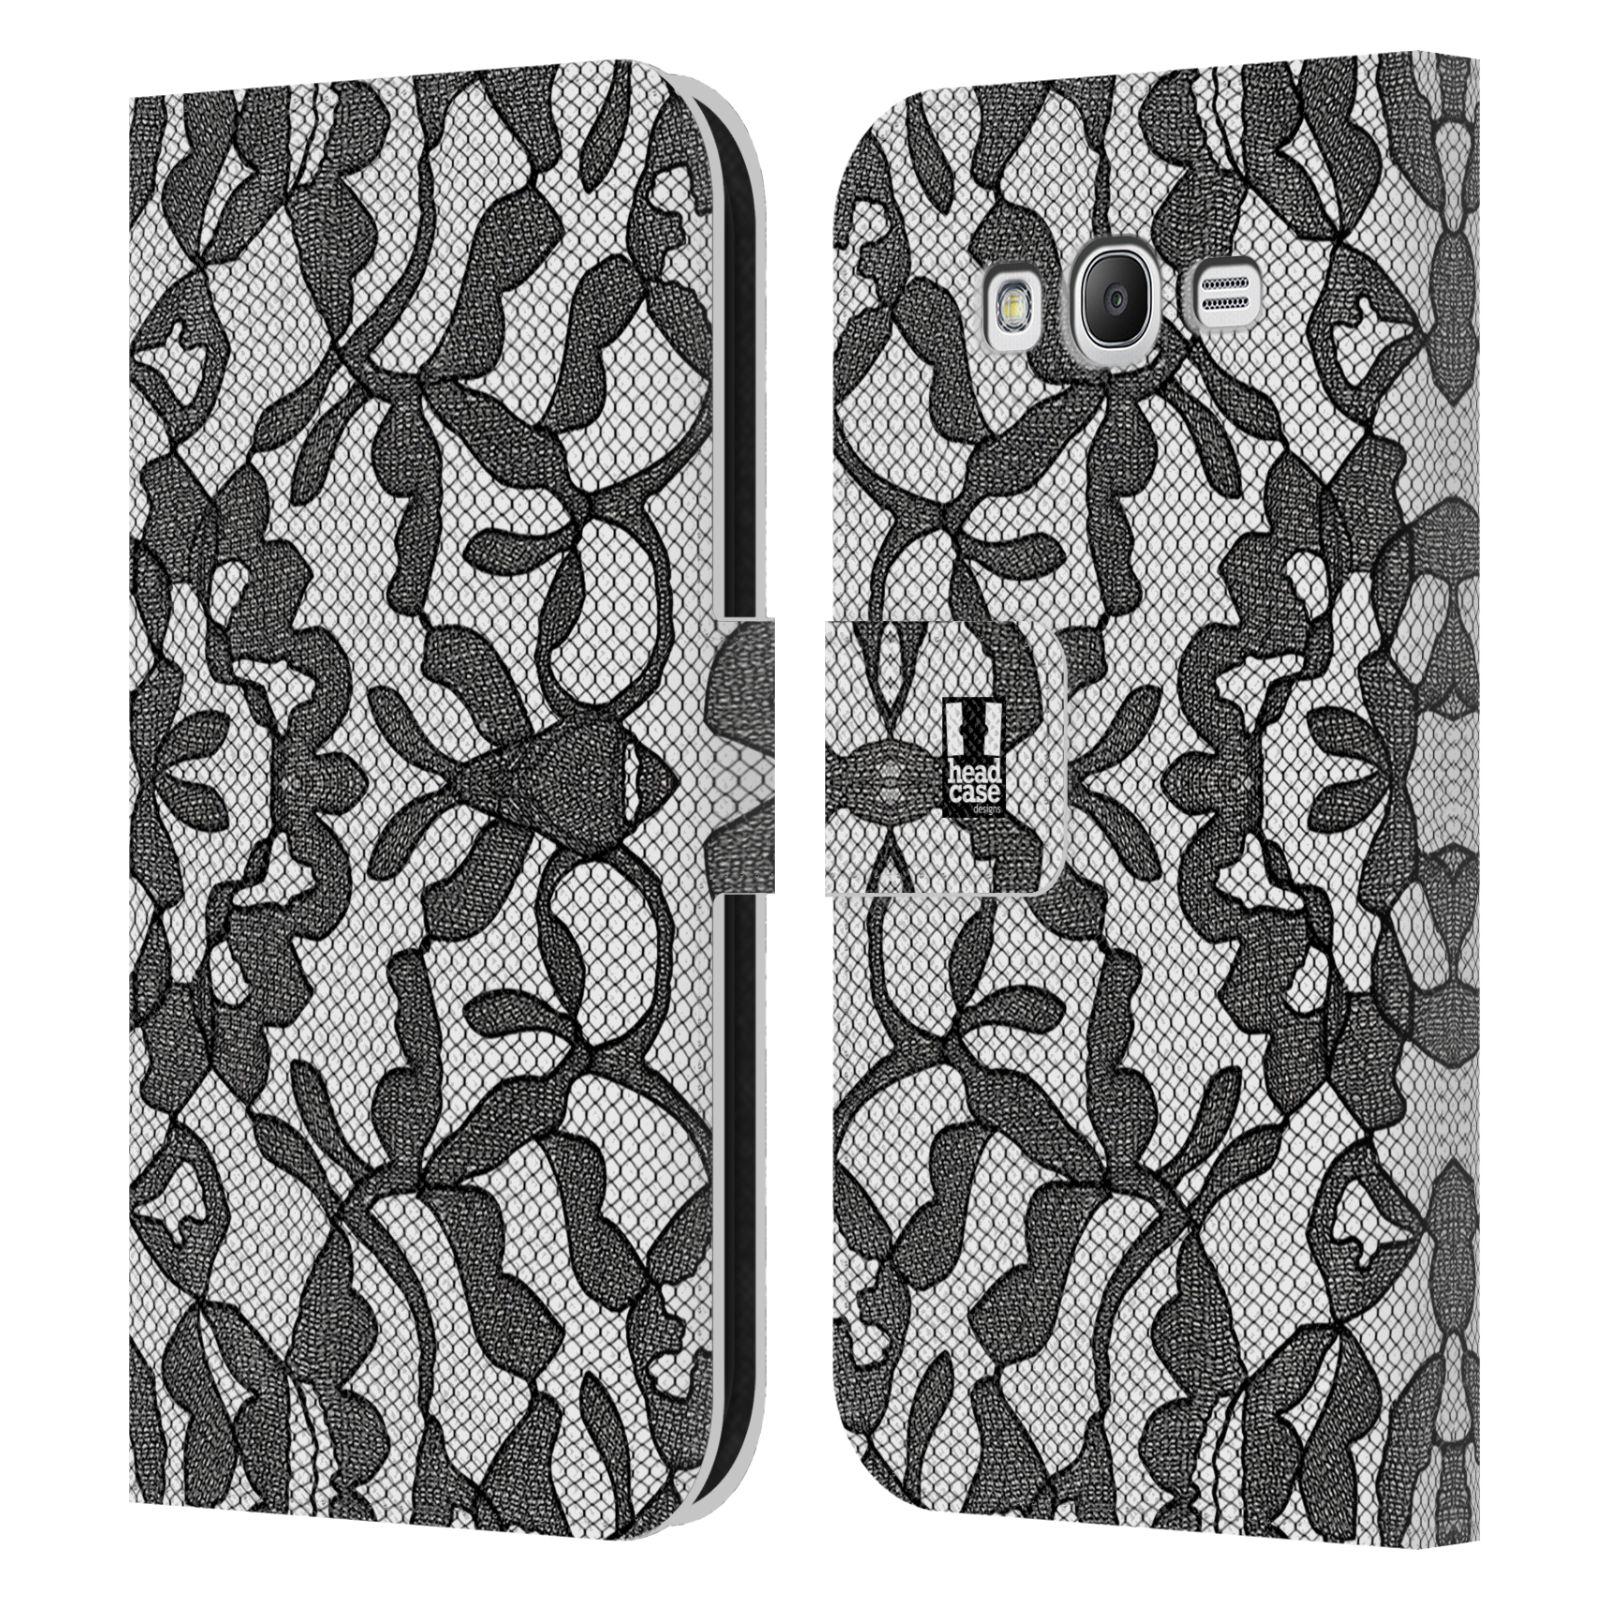 HEAD CASE Flipové pouzdro pro mobil Samsung Galaxy Grand i9080 ČERNOBÍLÁ KRAJKA lístečky